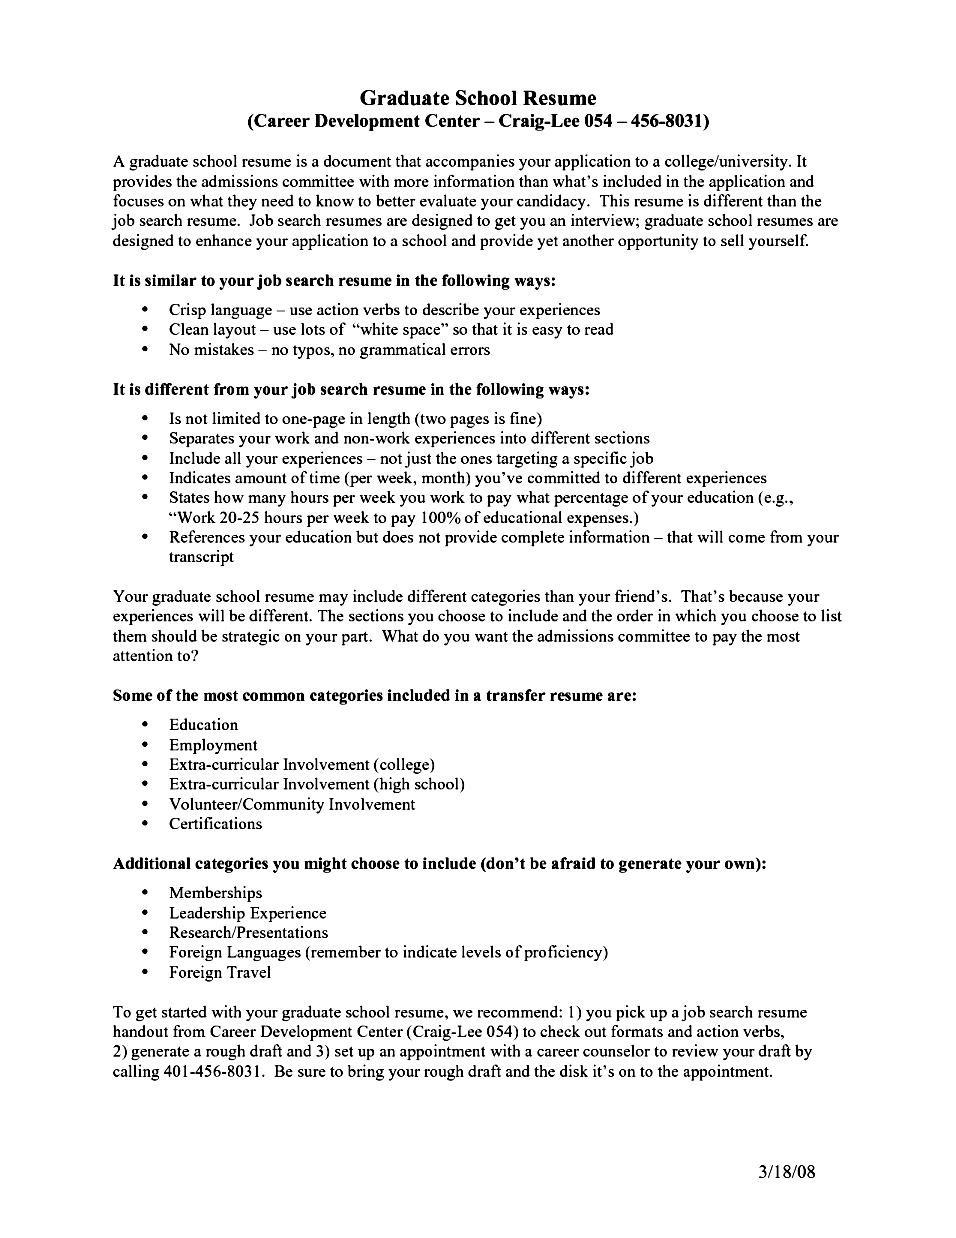 sample cv for graduate school